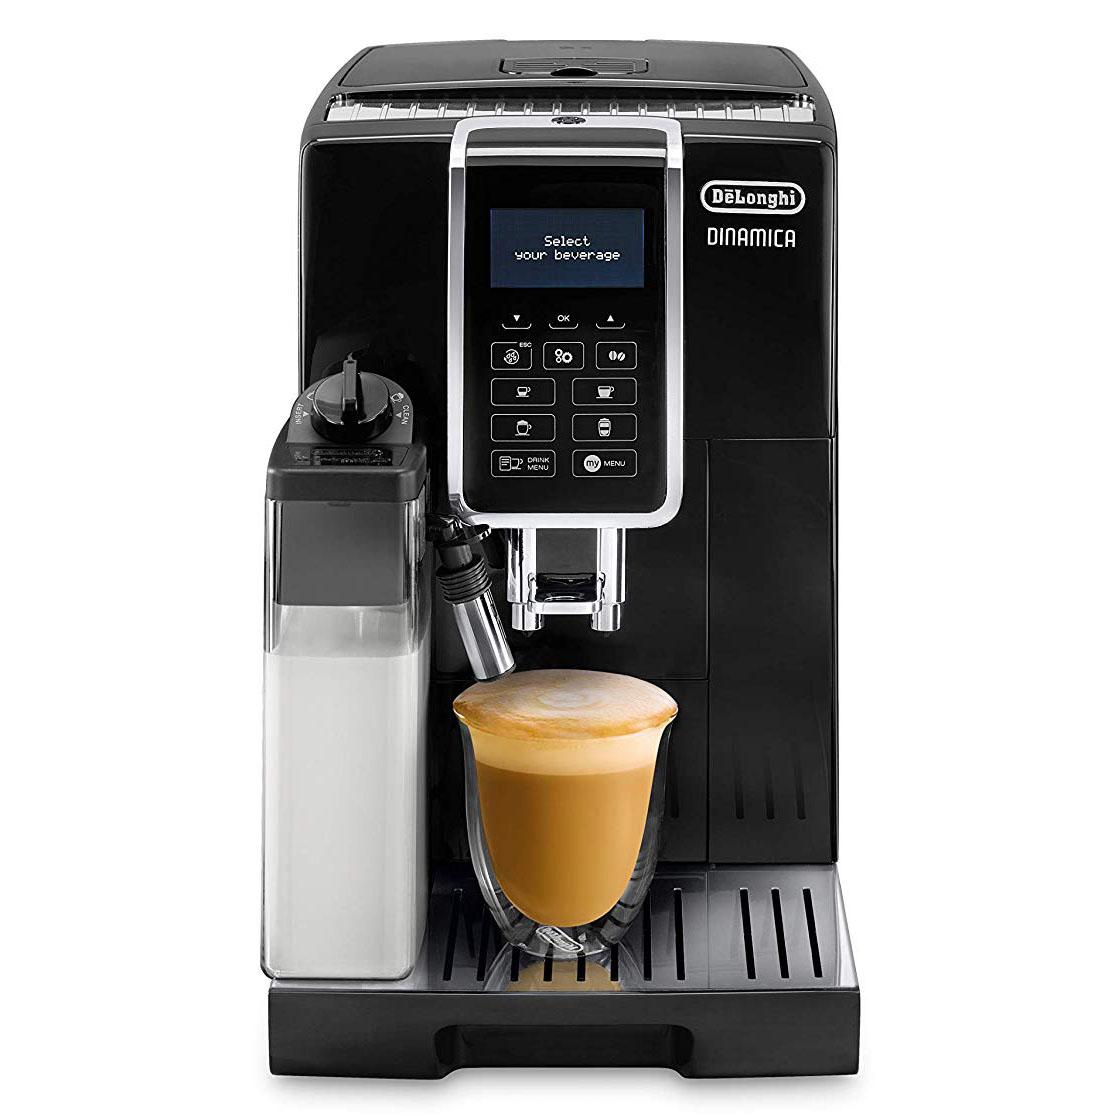 De'Longhi ECAM 350.55.B Dinamica Coffee Machine - Black